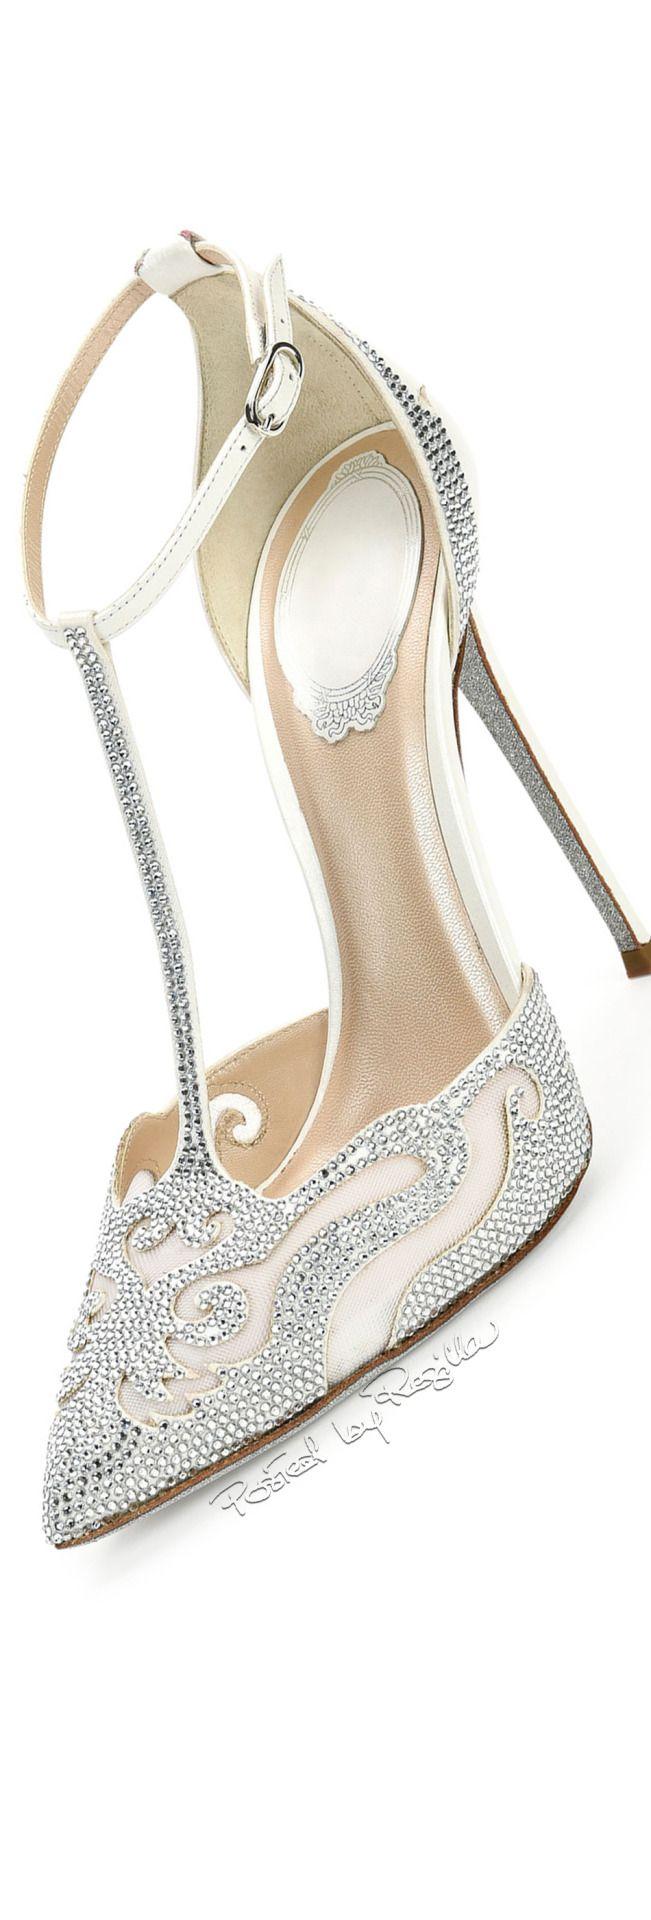 Rhinestone embellished heels #wedding-pinned by wedding decorations ...